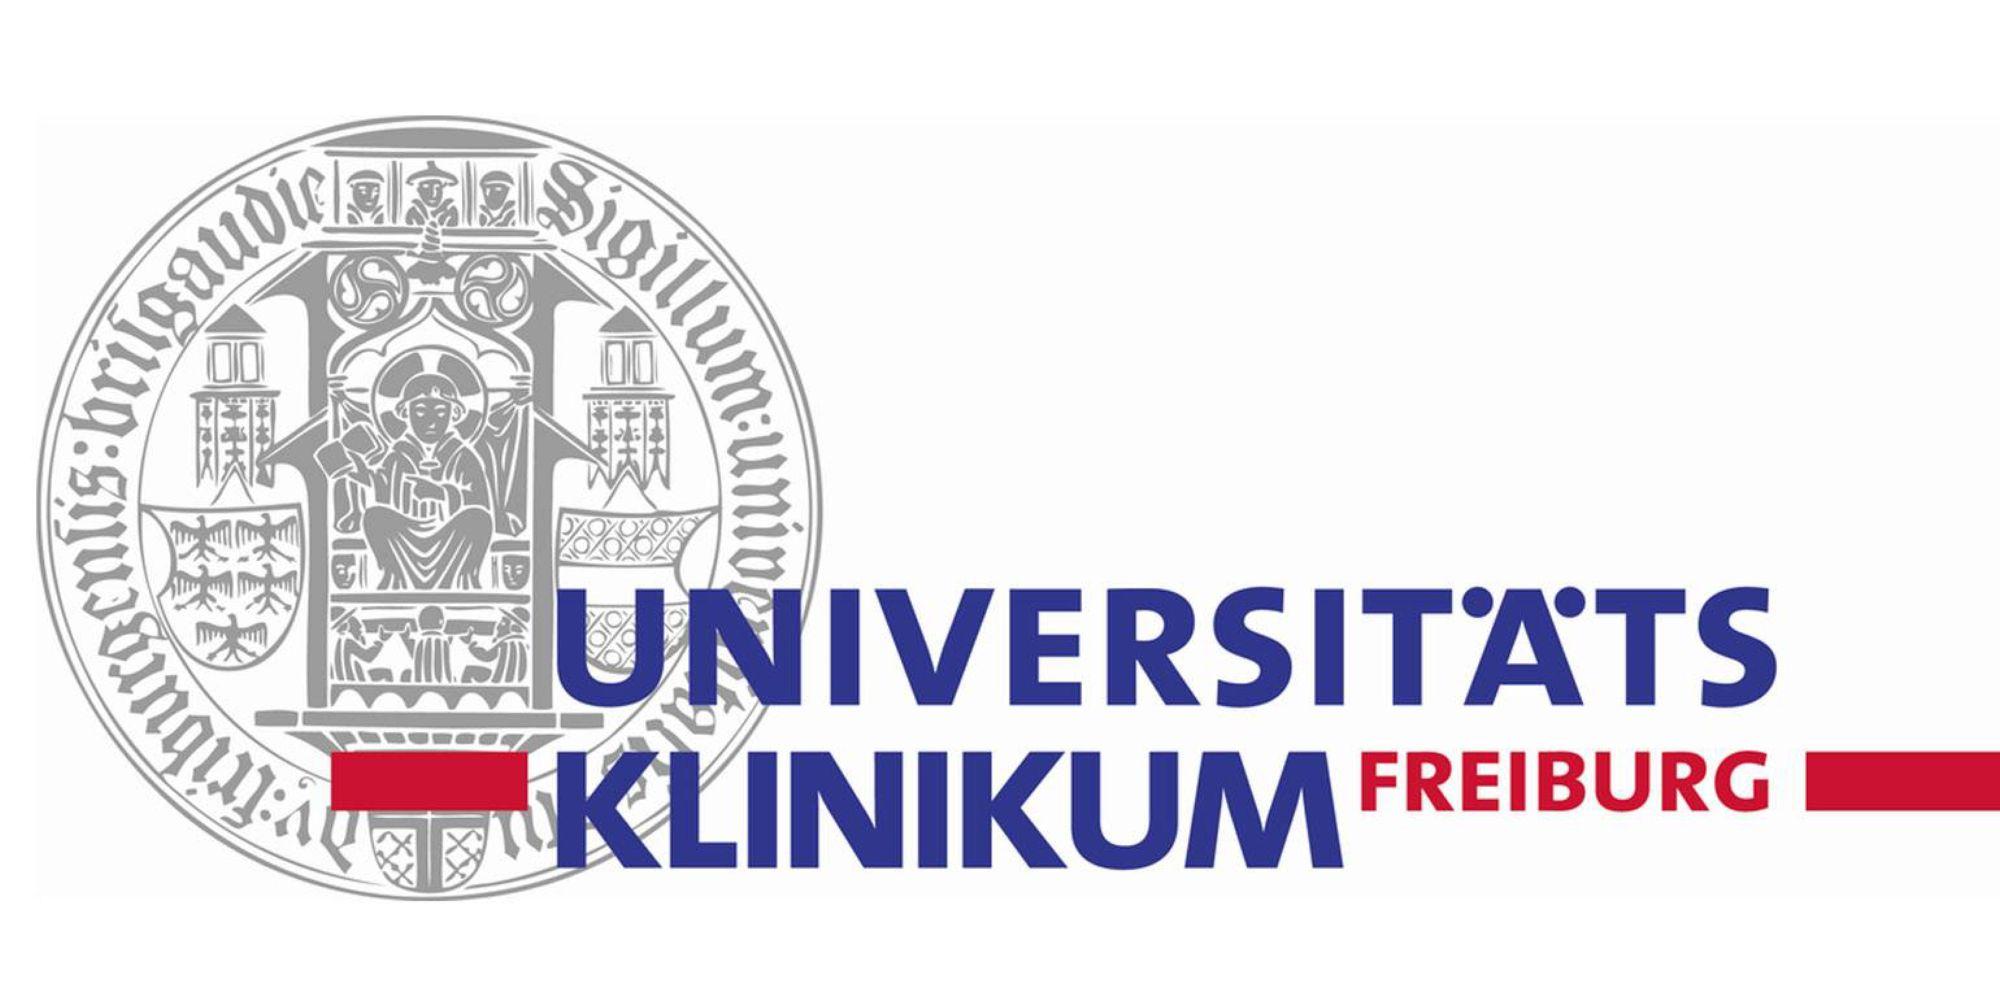 universitaetsklinikum-freiburg-logo-teaser.jpg